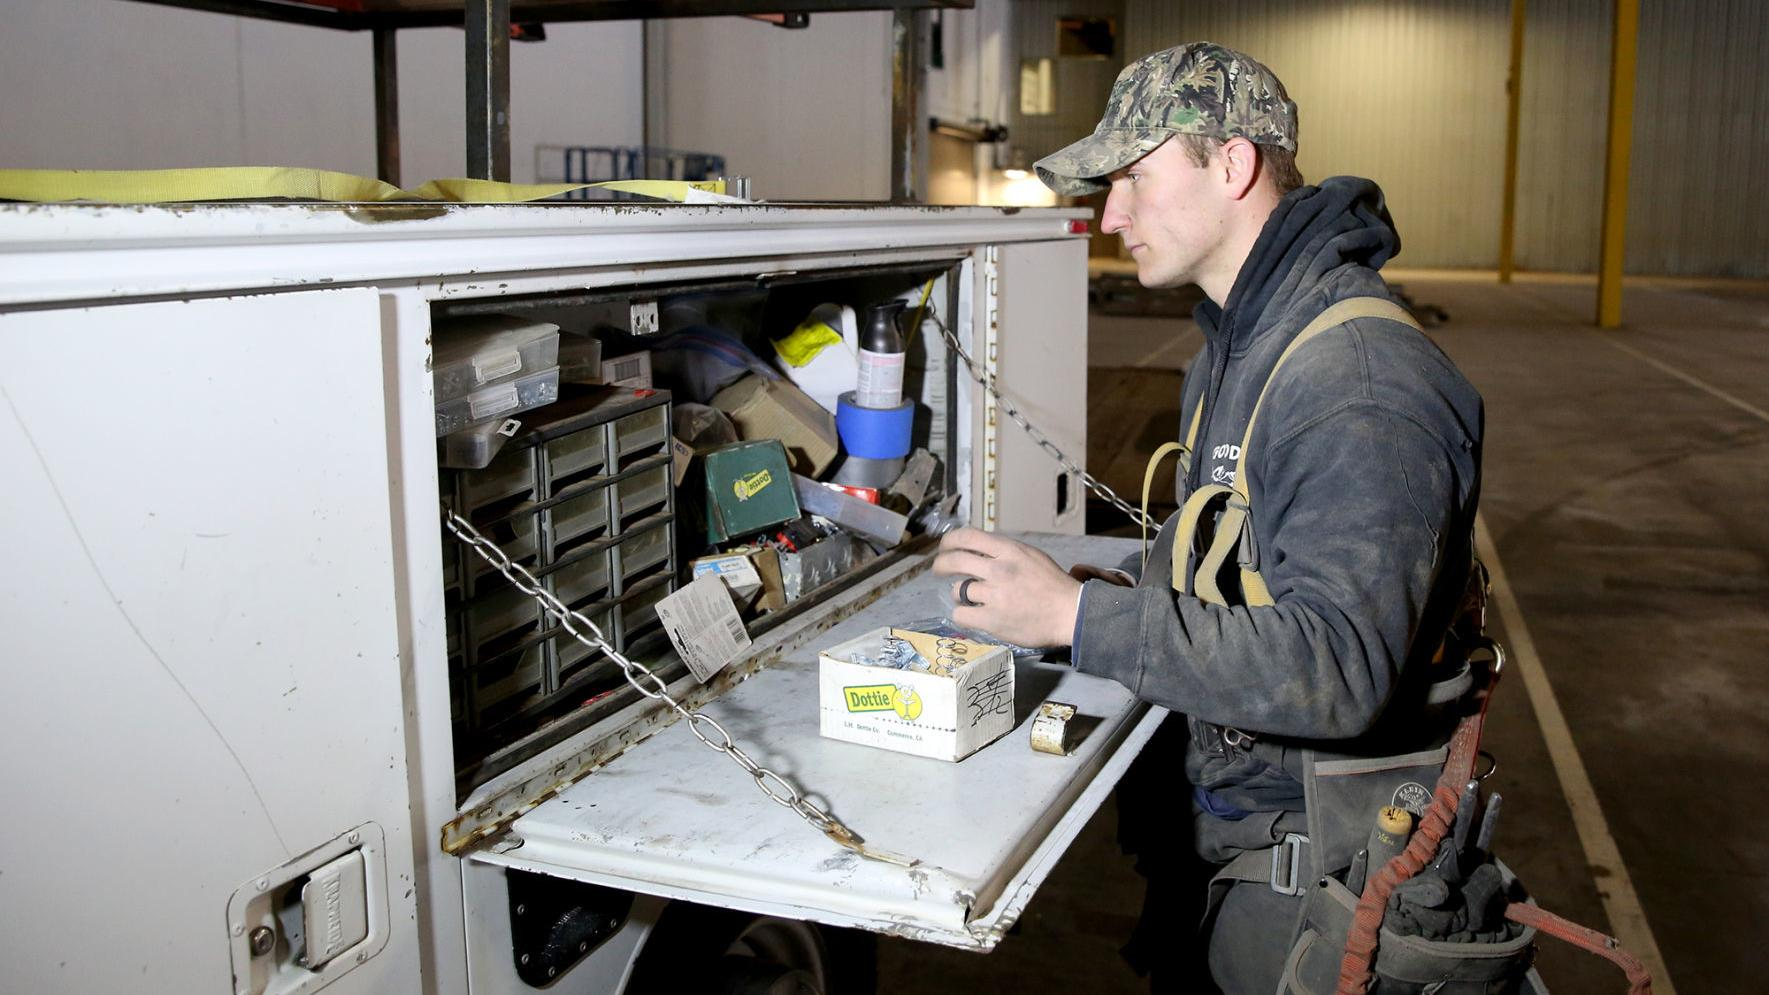 Electrical apprenticeship wins exemplary program award